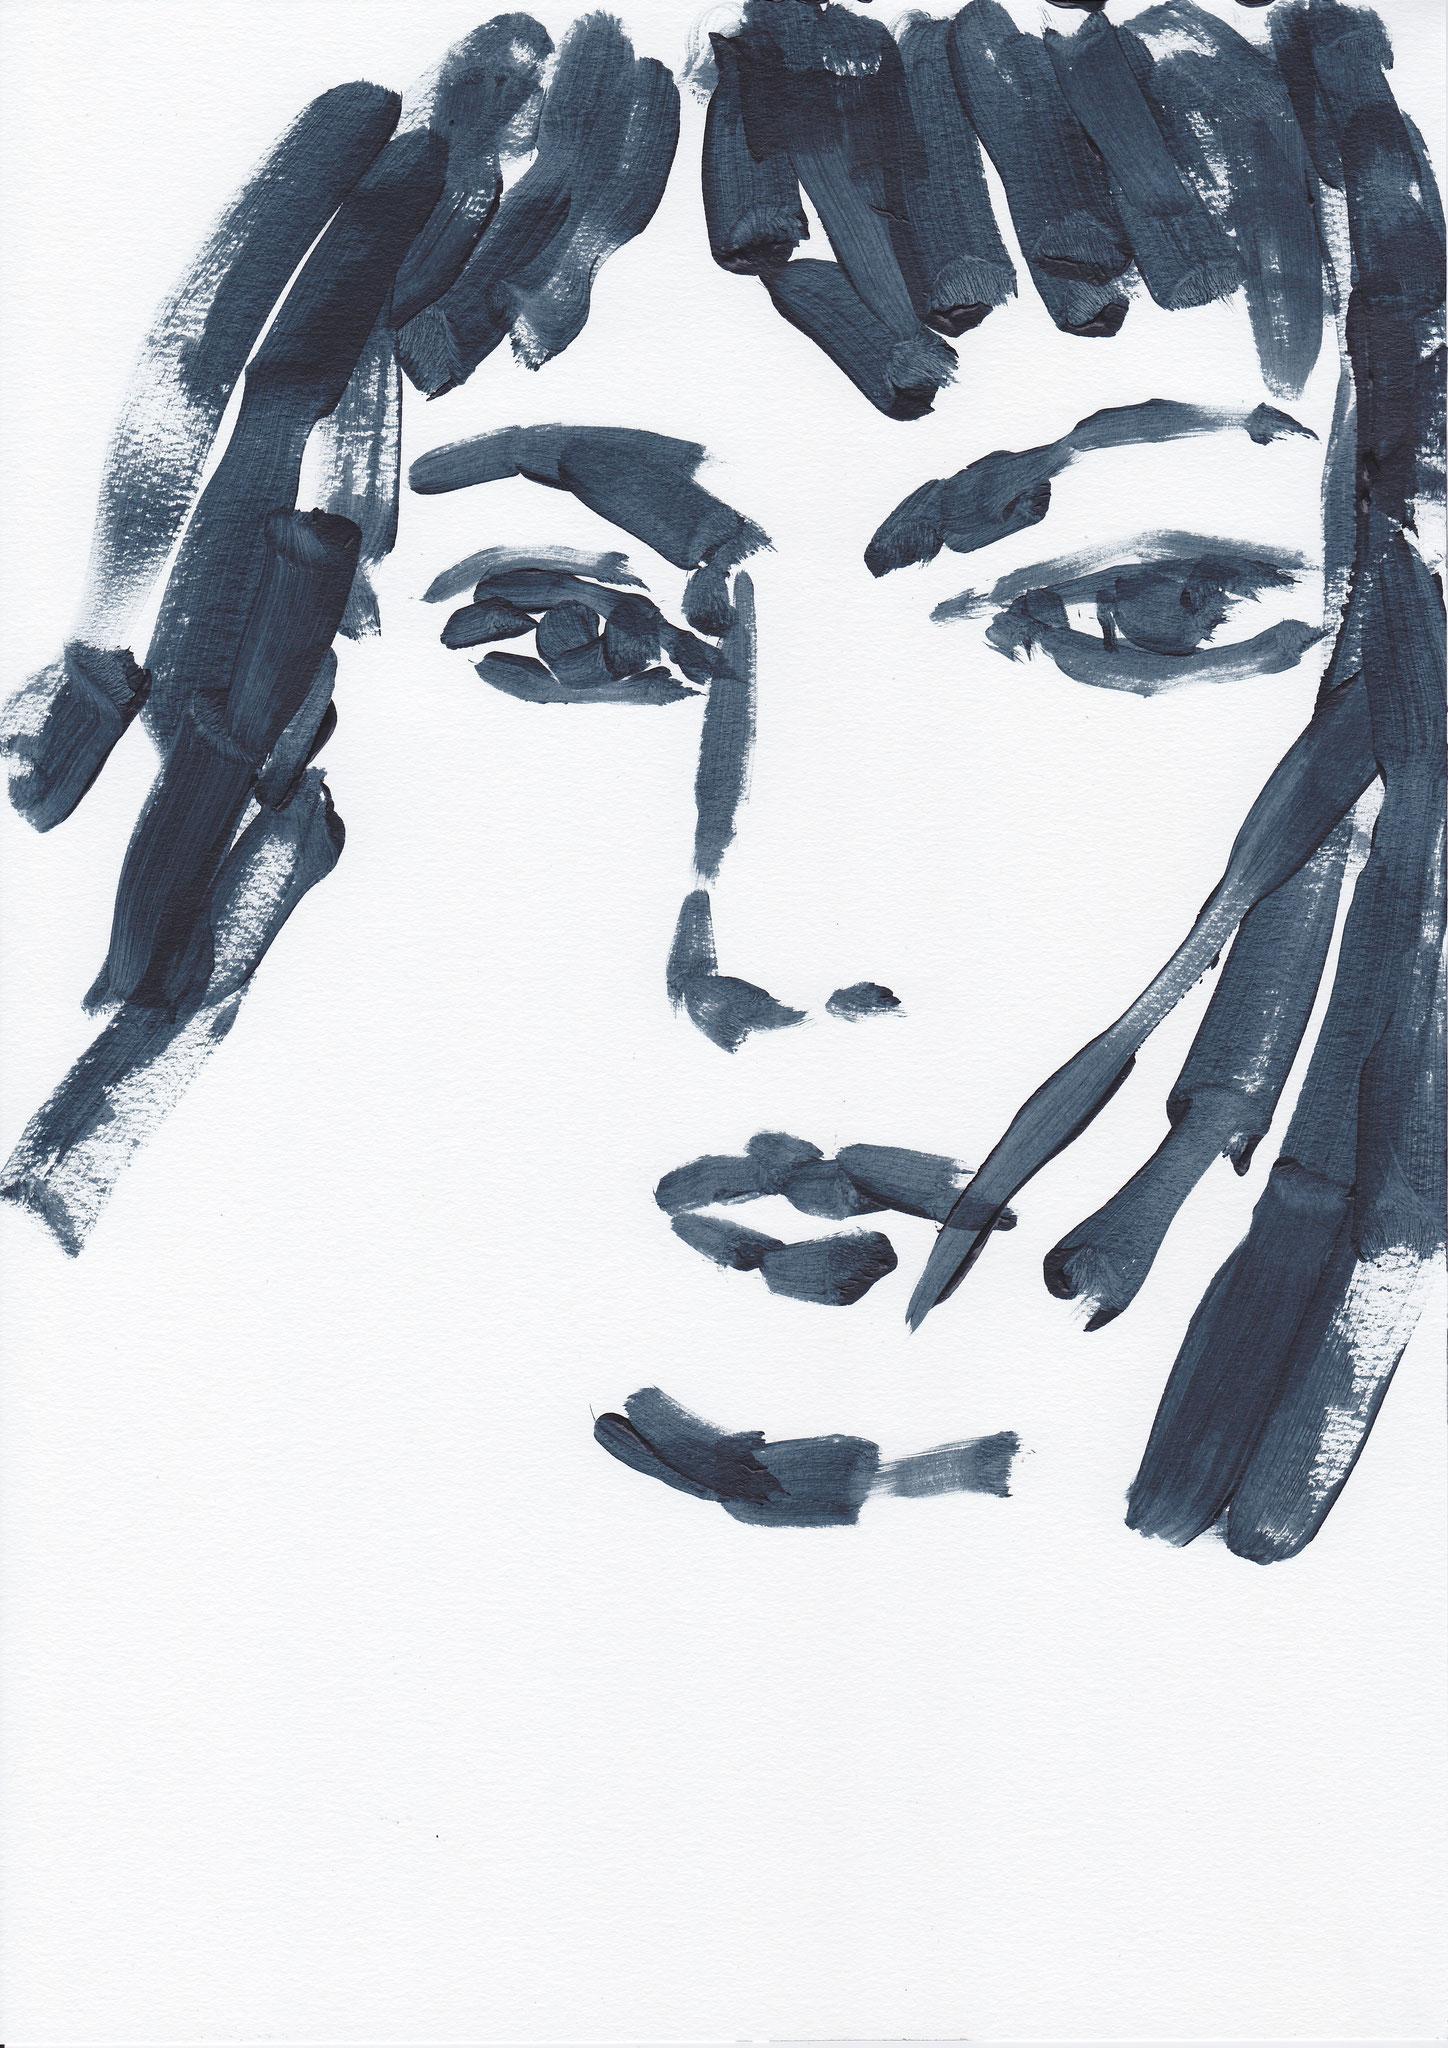 051 , acrylic on paper , 29.7 x 21cm , Selina Saranova